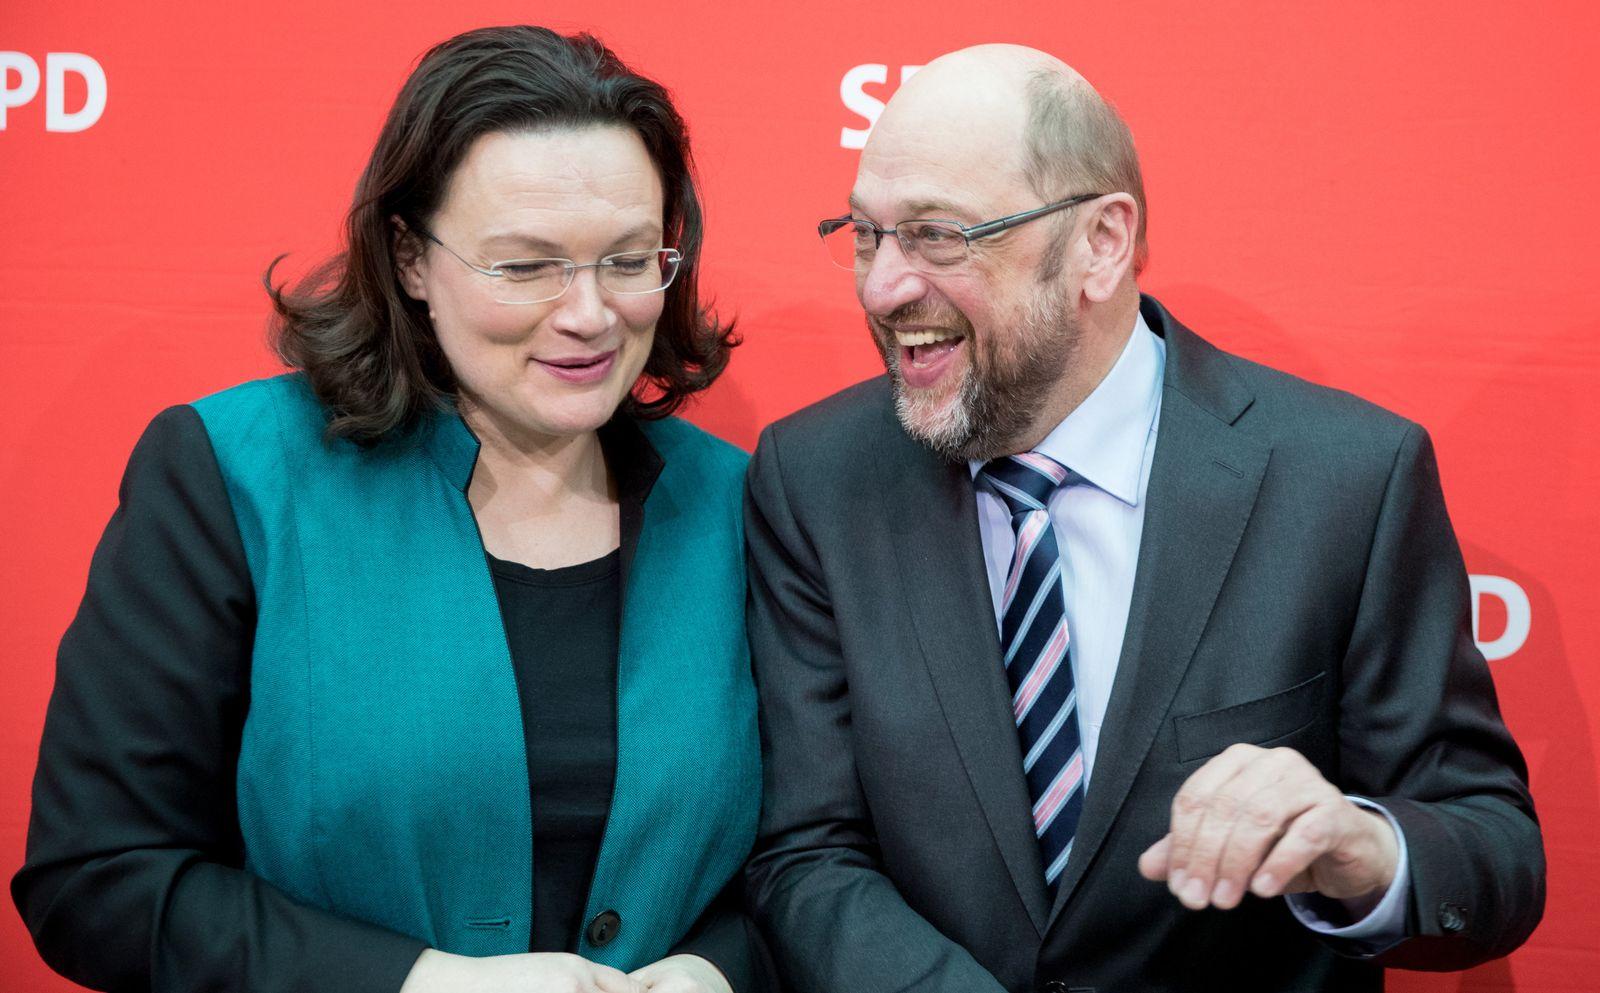 SPD / Parteivorstand / Andrea Nahles / Martin Schulz